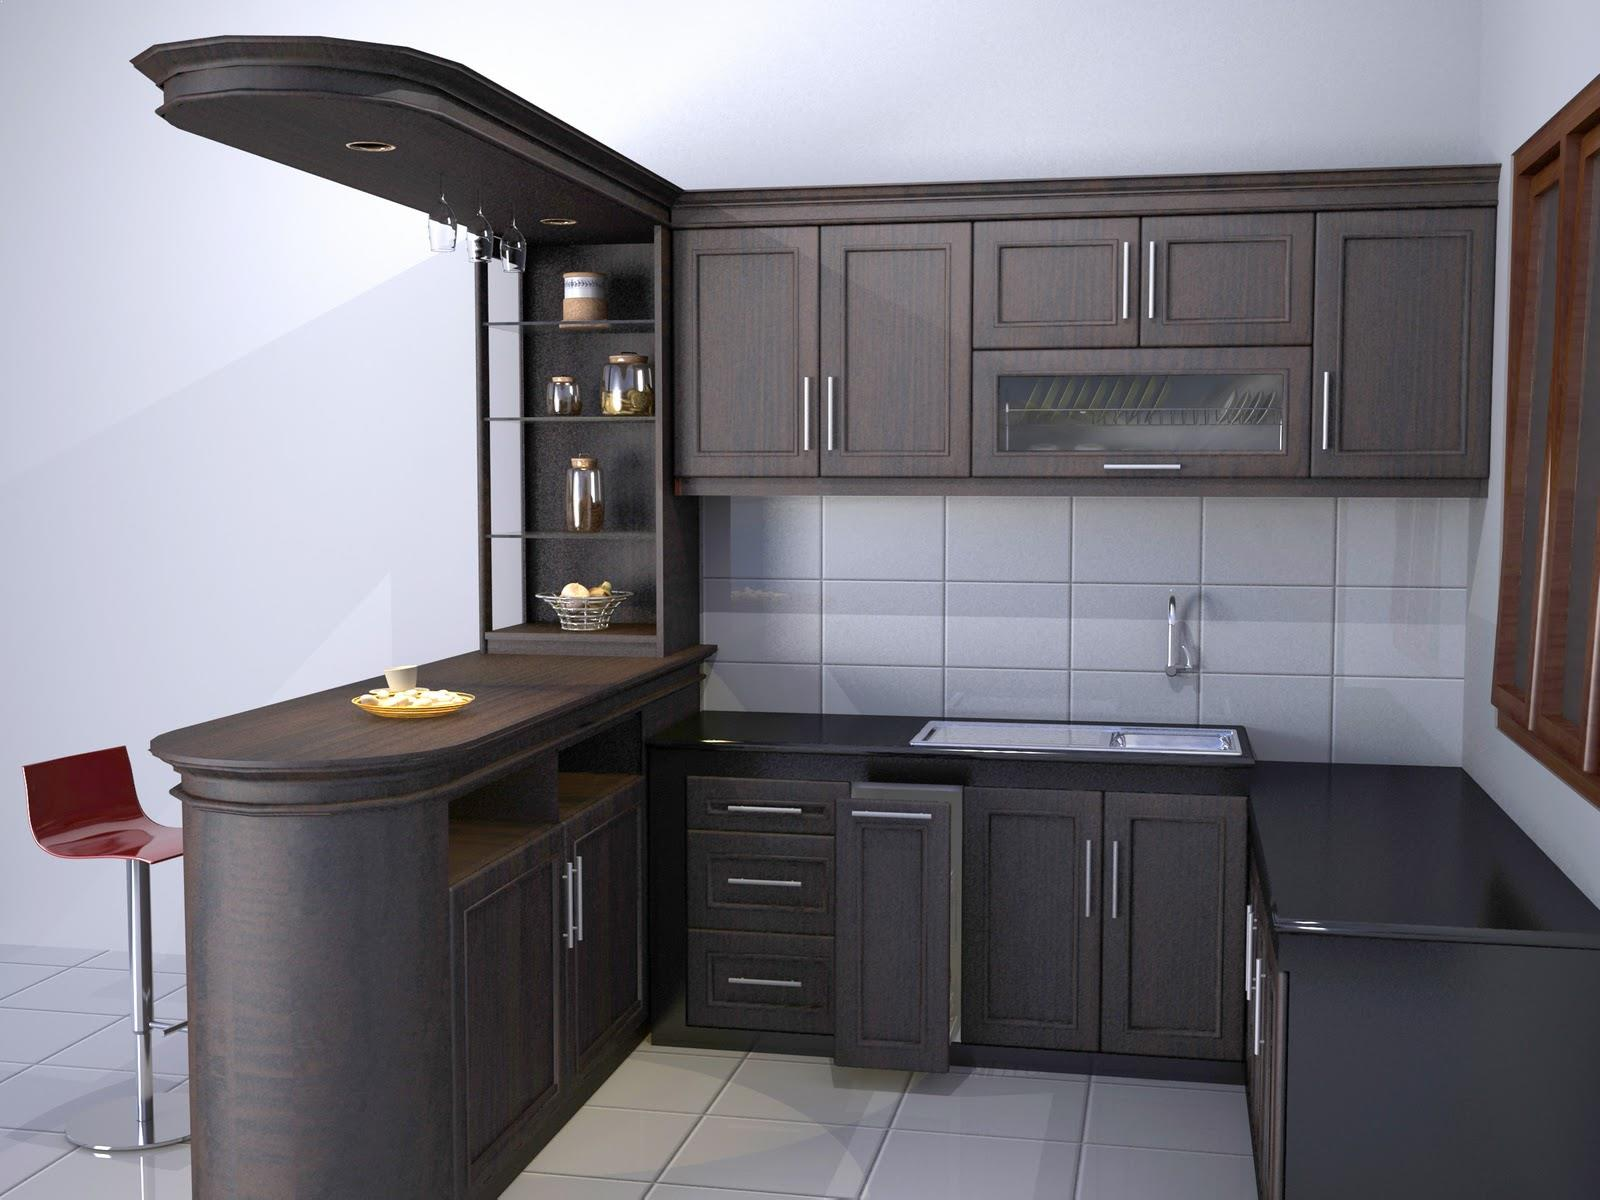 model kitchen set aluminium